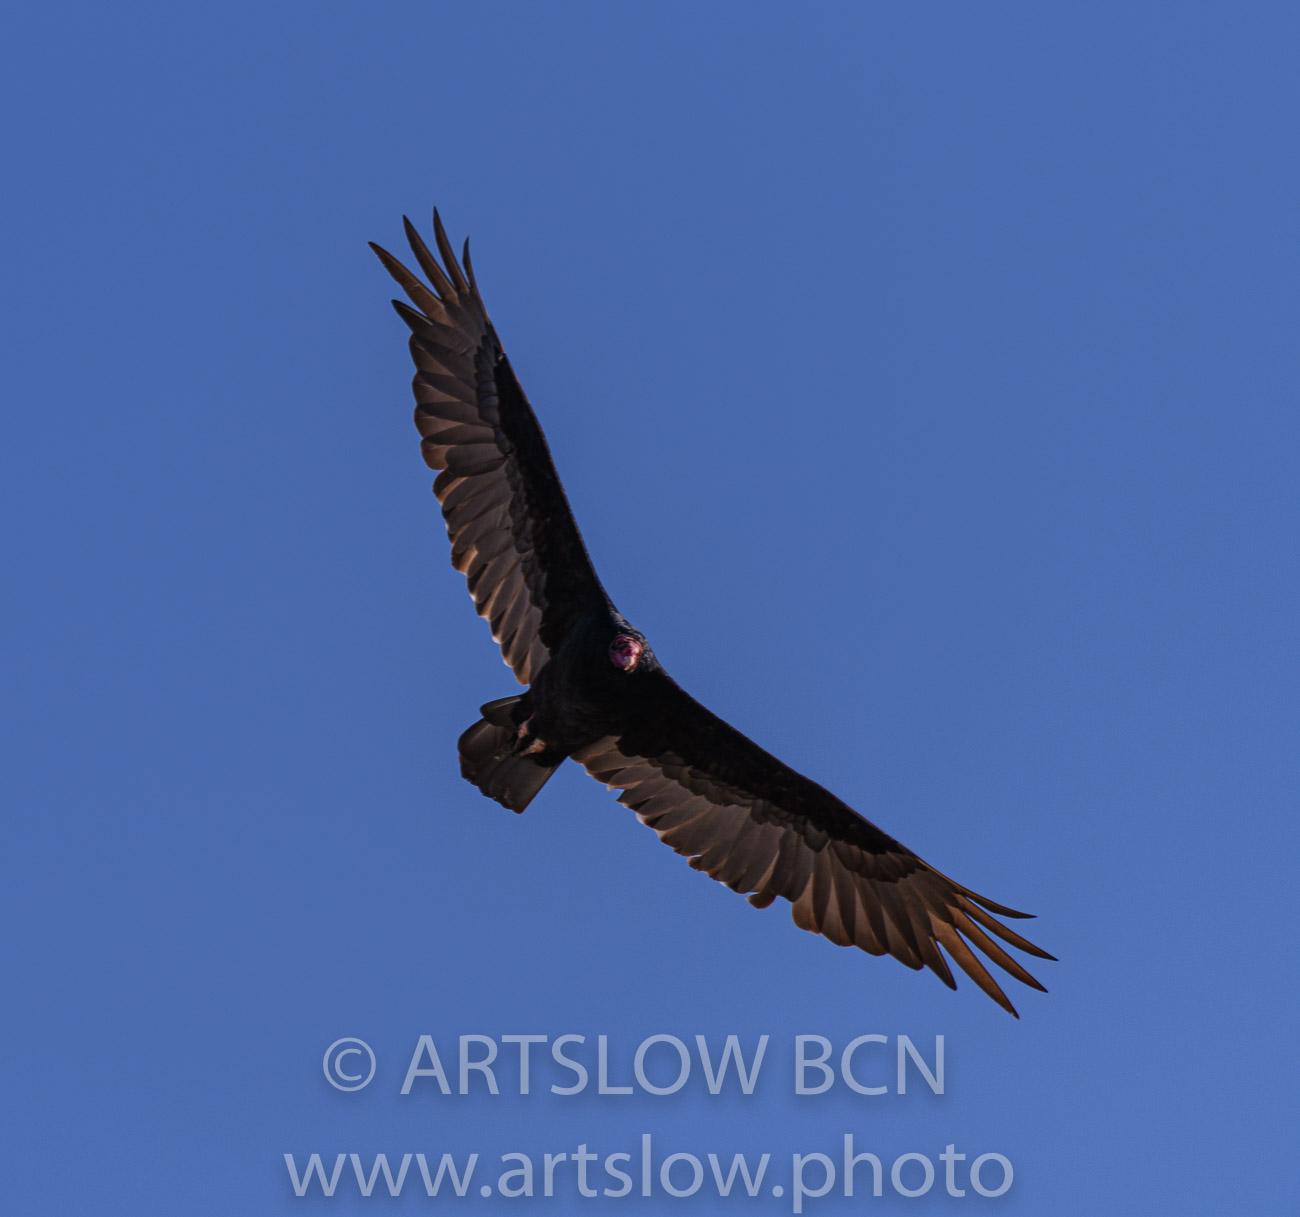 2002-8823-Gallinazo, Turkey Vulture, (Cathartes aura),  - Paisajes Tropicales - ARTSLOW BCN GALLERY SHOP, www.artslow.photo